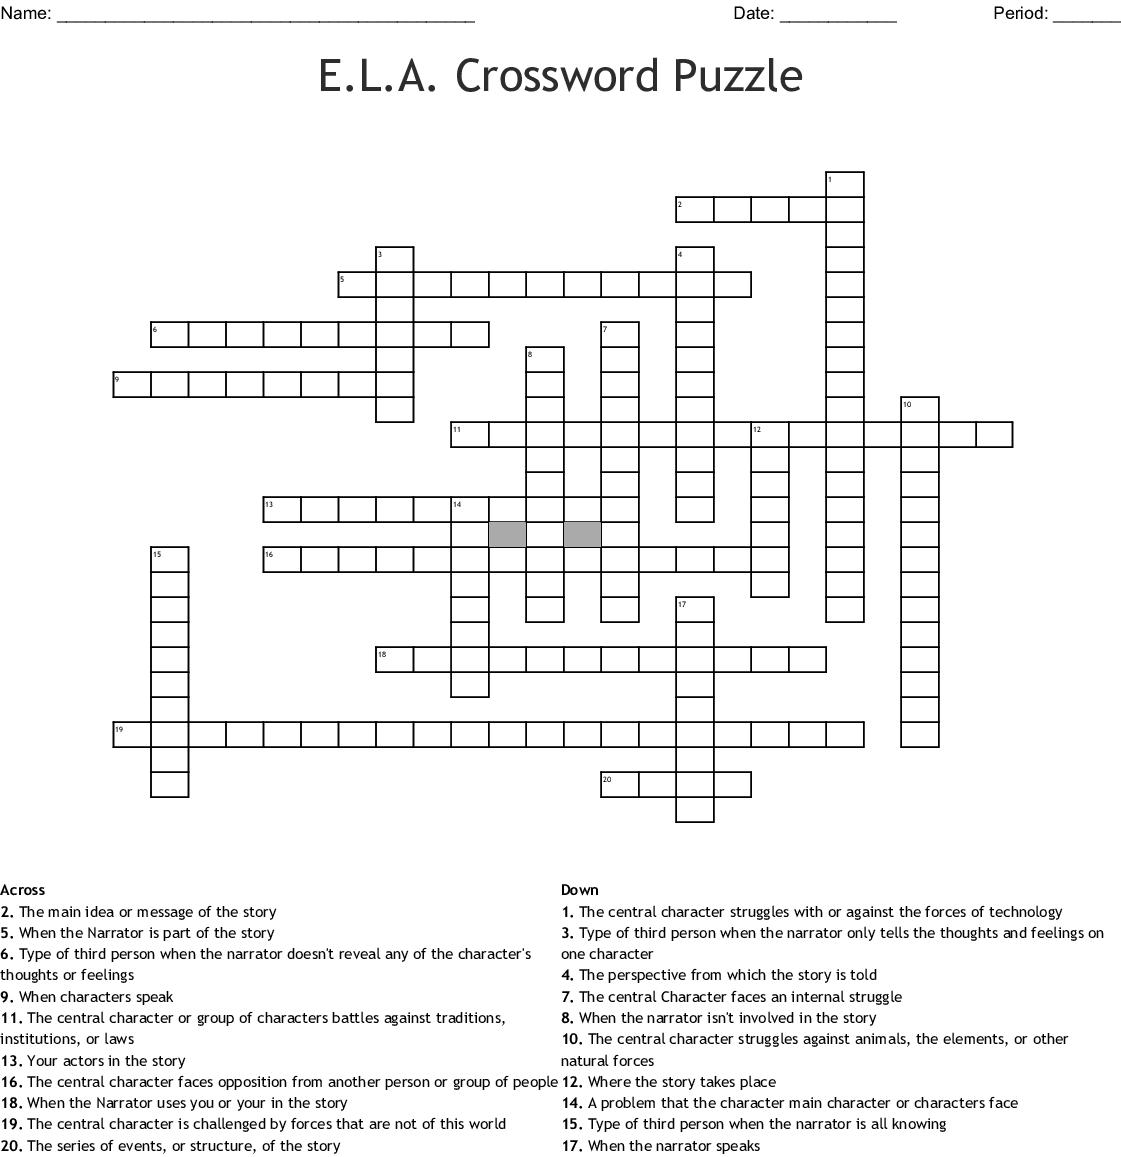 E.l.a. Crossword Puzzle Crossword - Wordmint - Crossword Printable 7Th Grade